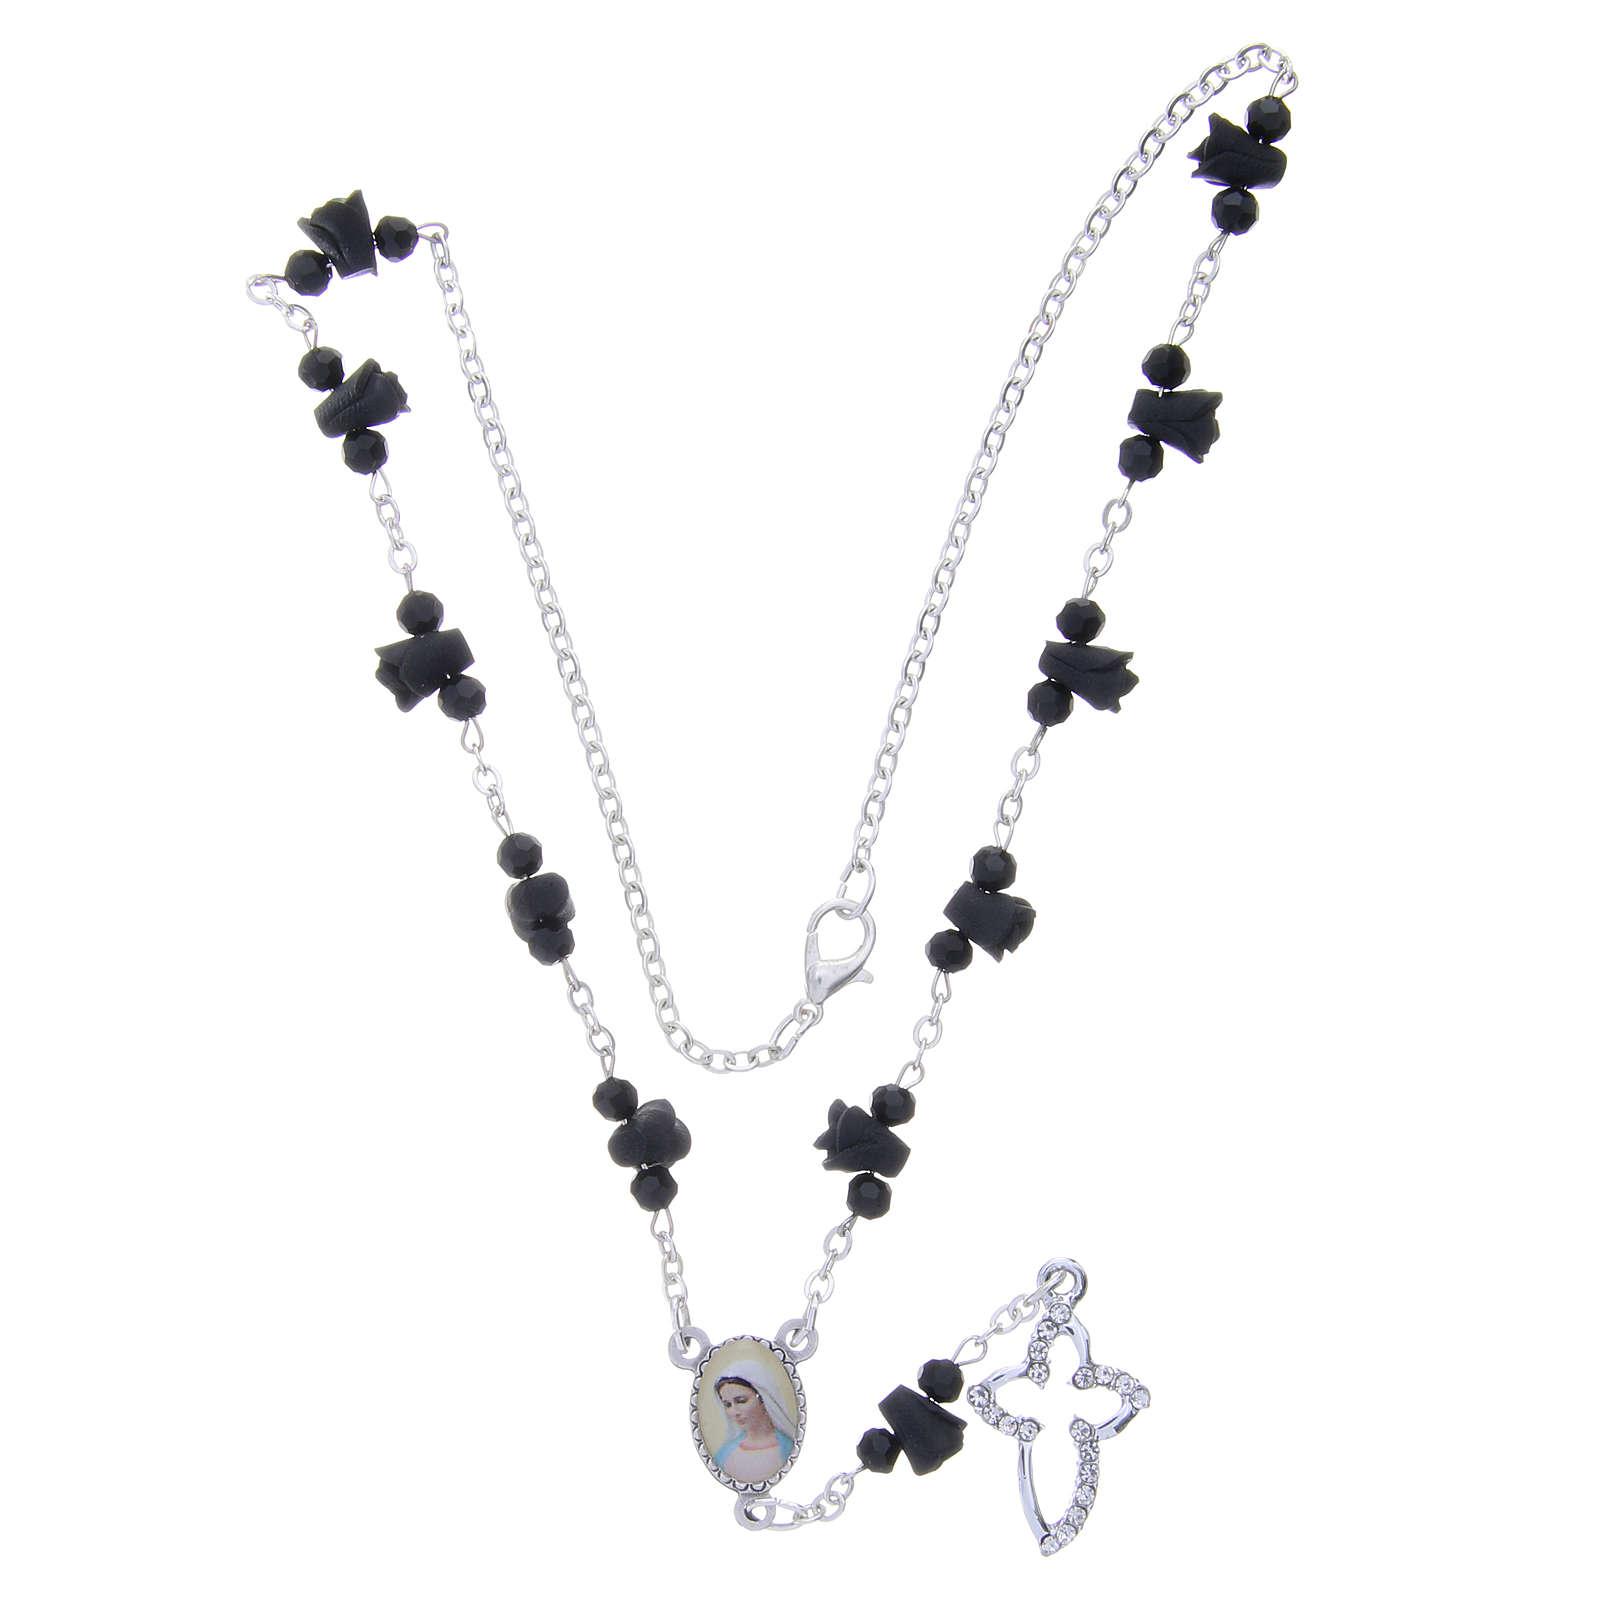 Collier chapelet Medjugorje roses noires céramique icône Vierge 4